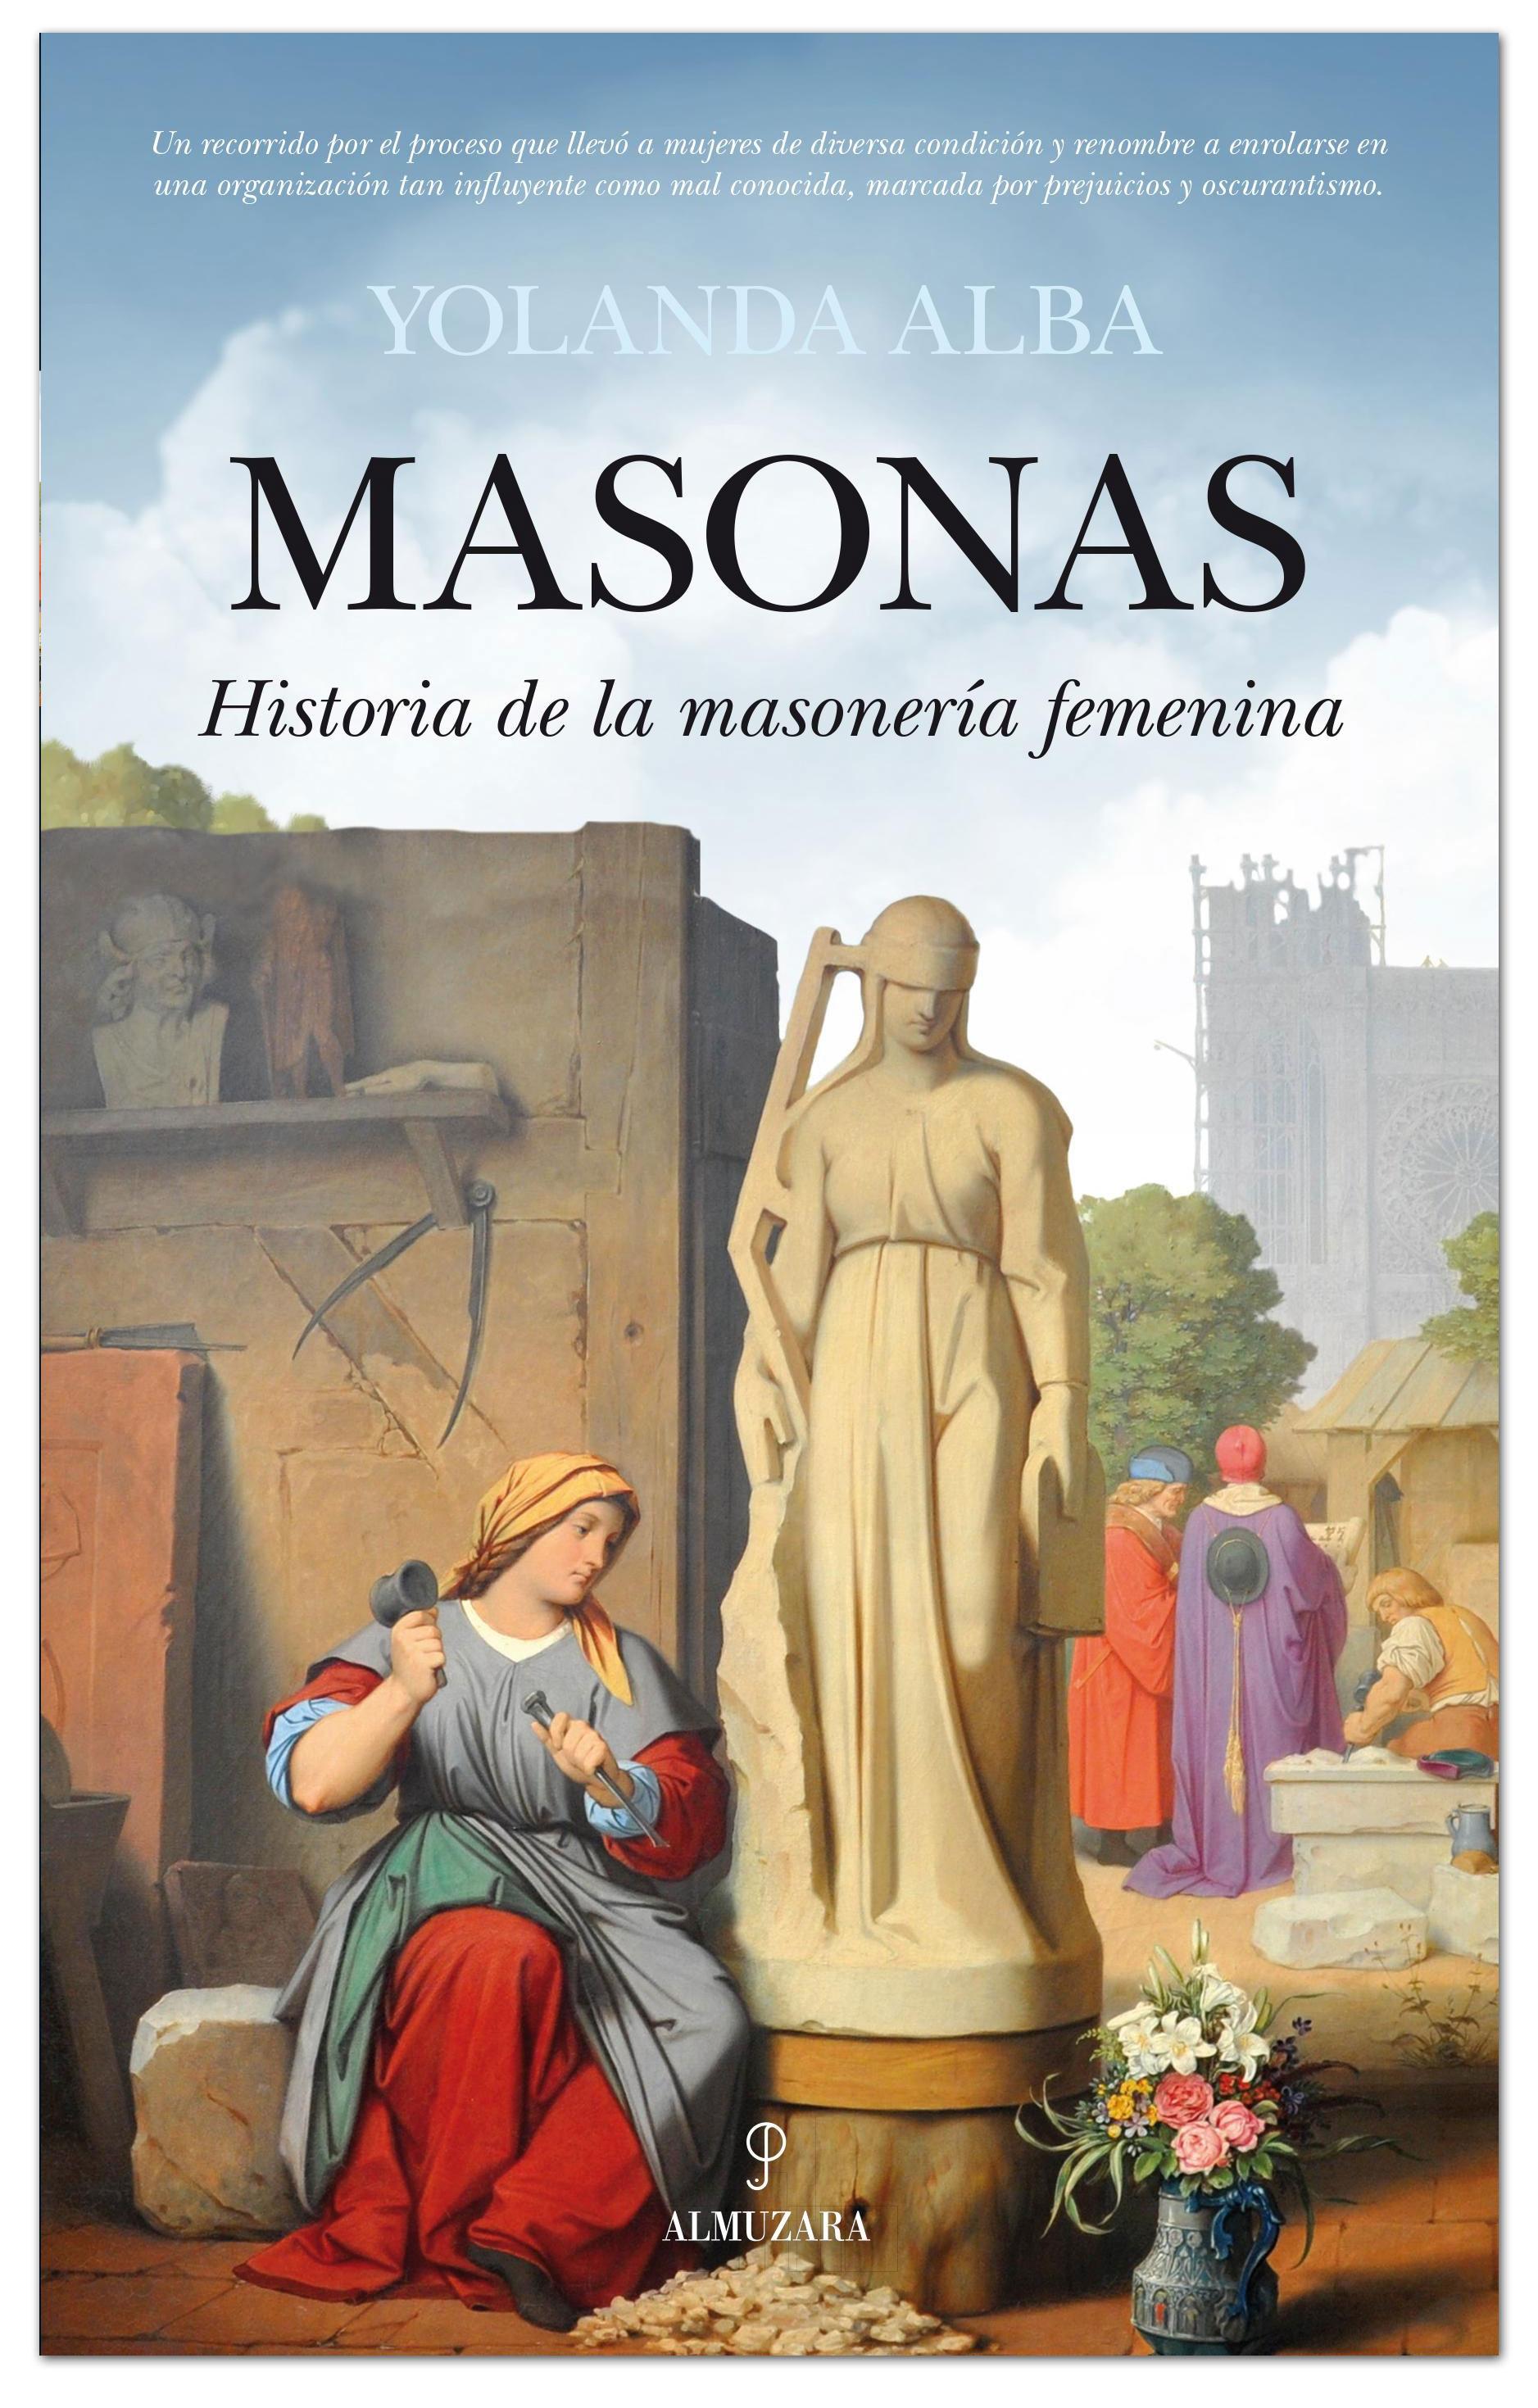 Masonas. Historia de la masonería femenina - Yolanda Alba